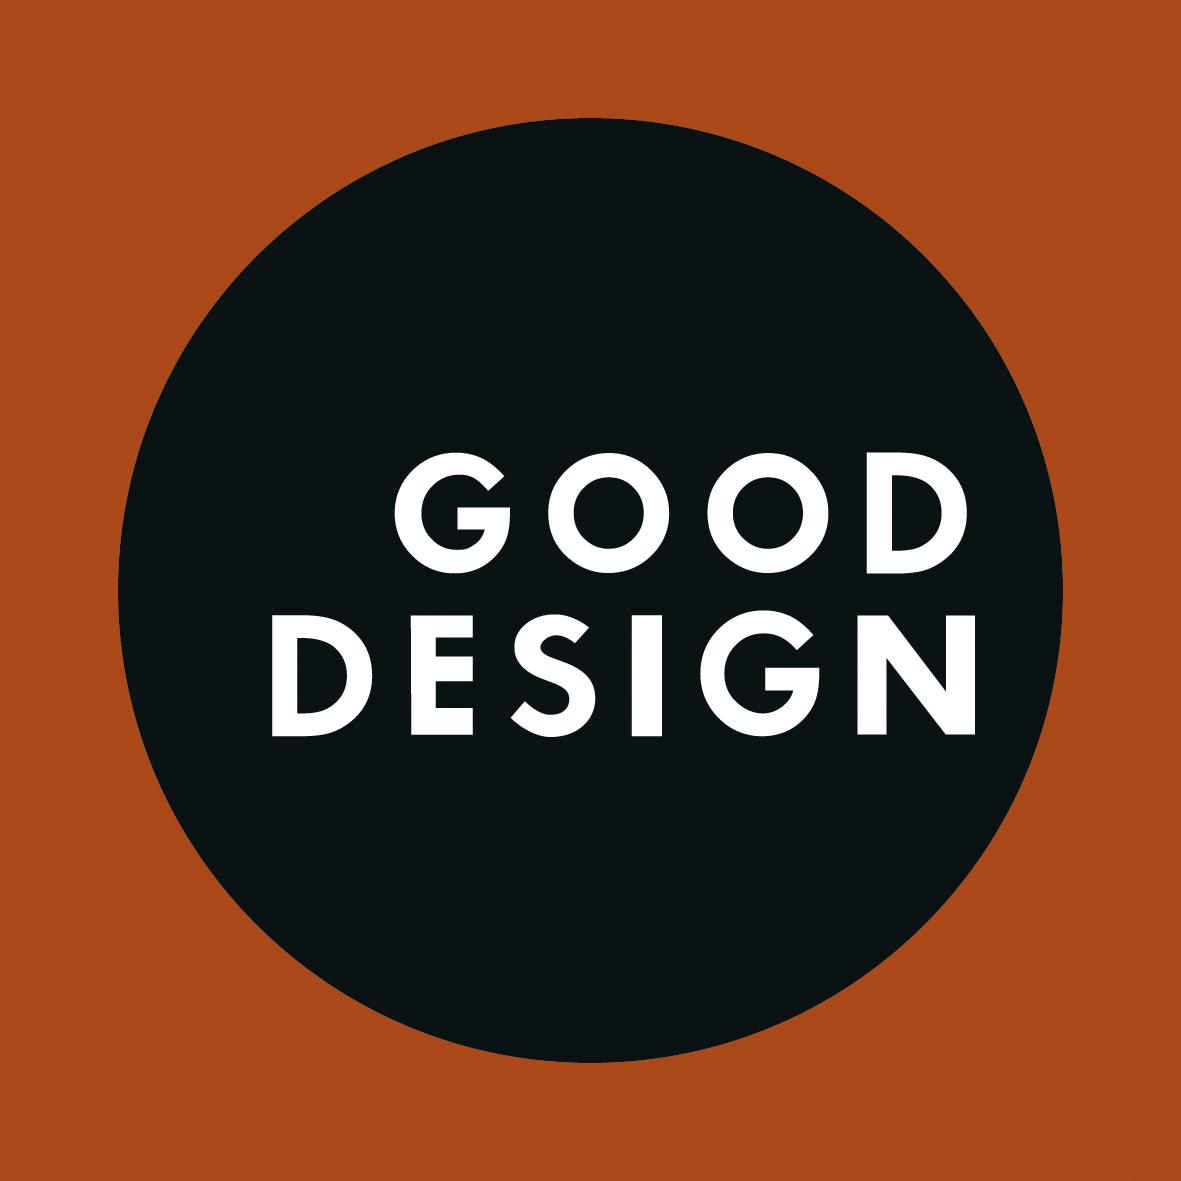 good-design-button-for-website.jpg